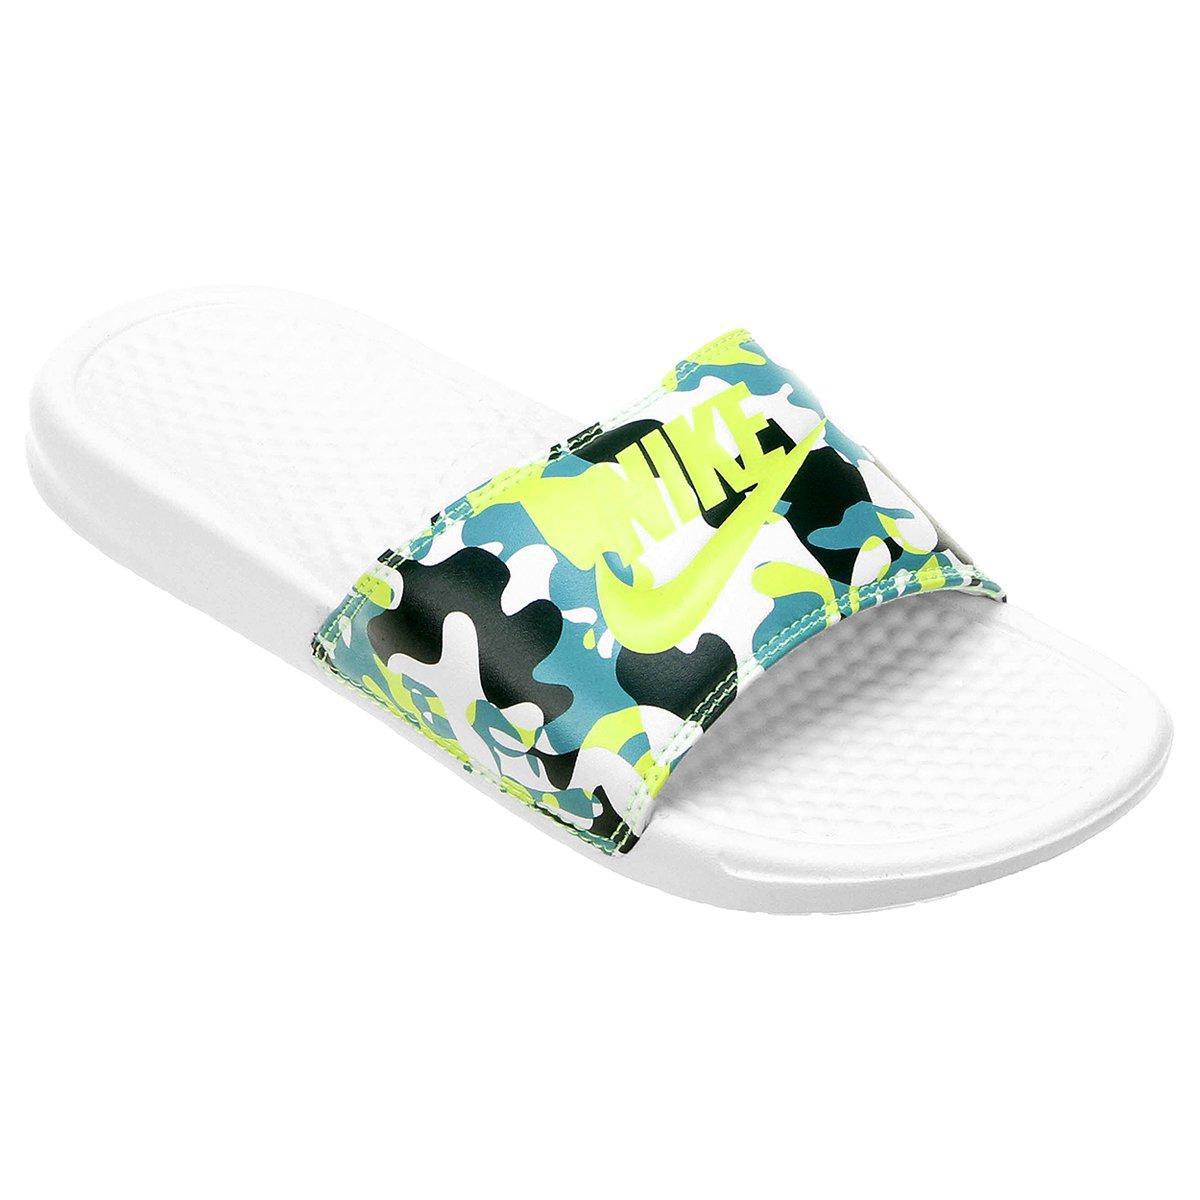 3a7182b355 Sandália Nike Benassi Jdi Print Feminina - Compre Agora